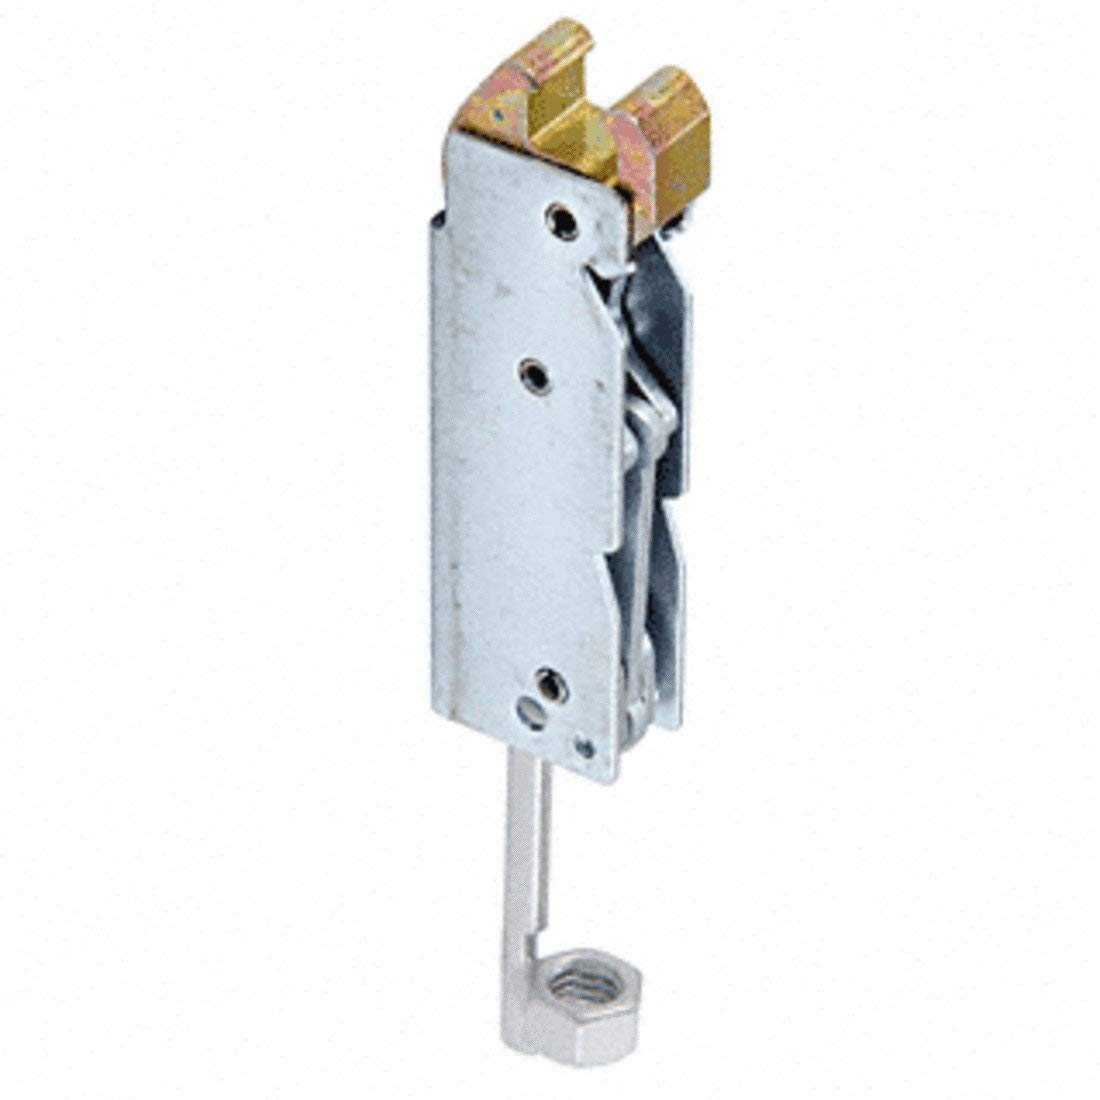 door hardware Durable commercial /& residential Slimline Panic Exit Device in Bronze Finish locks door handles Grade 1 in Bronze Finish for 36 door